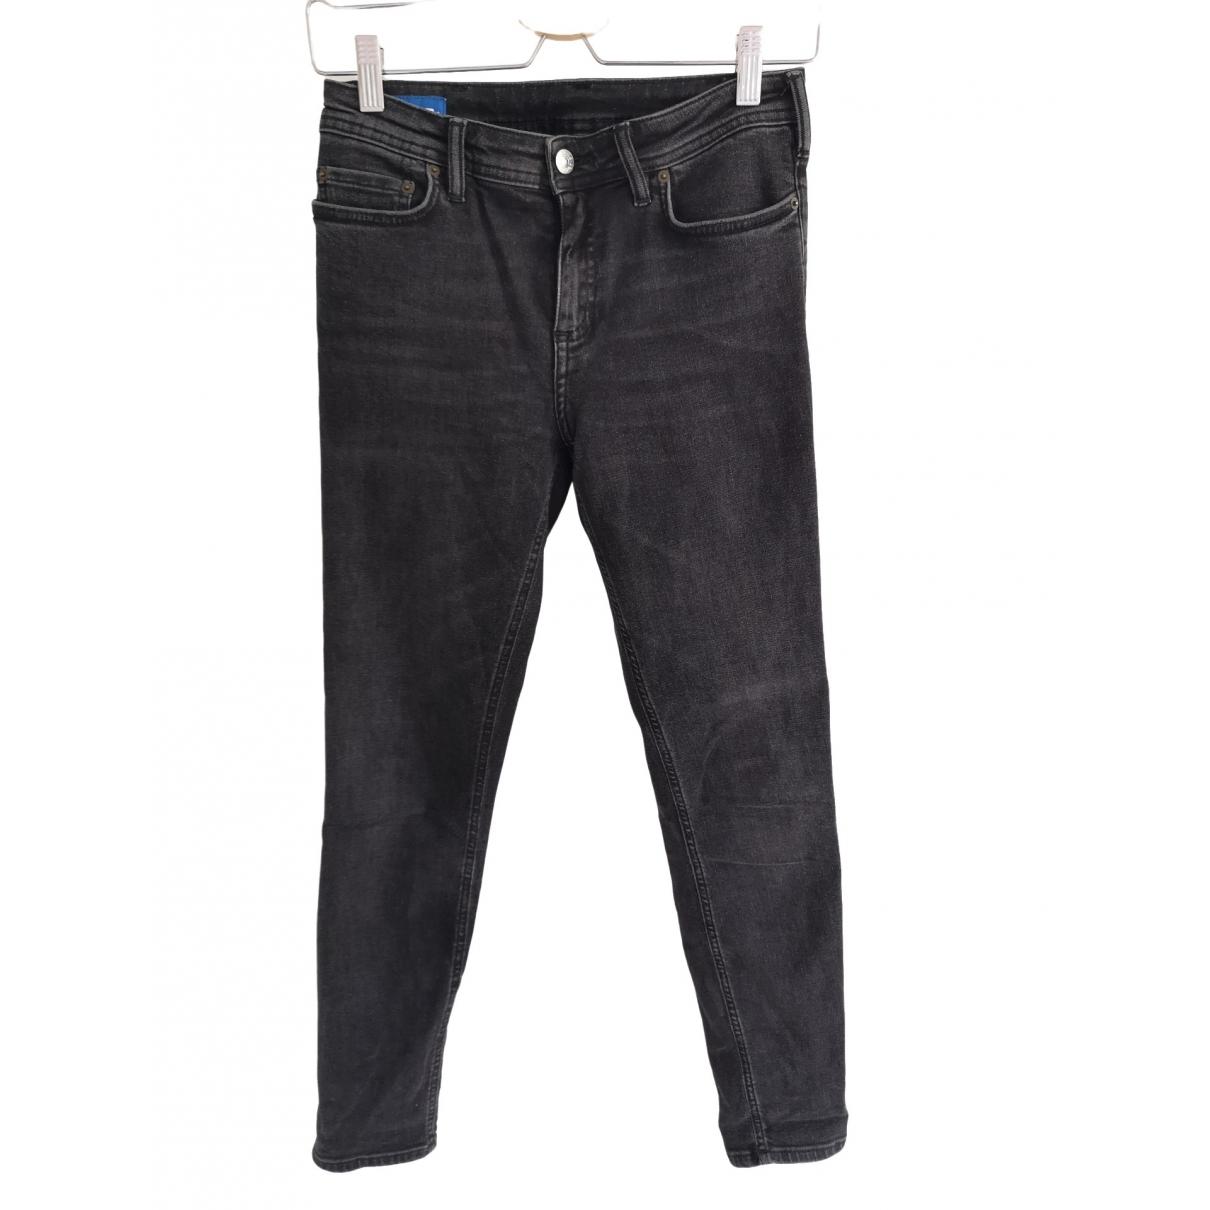 Acne Studios Blå Konst Black Cotton Jeans for Women 26 US